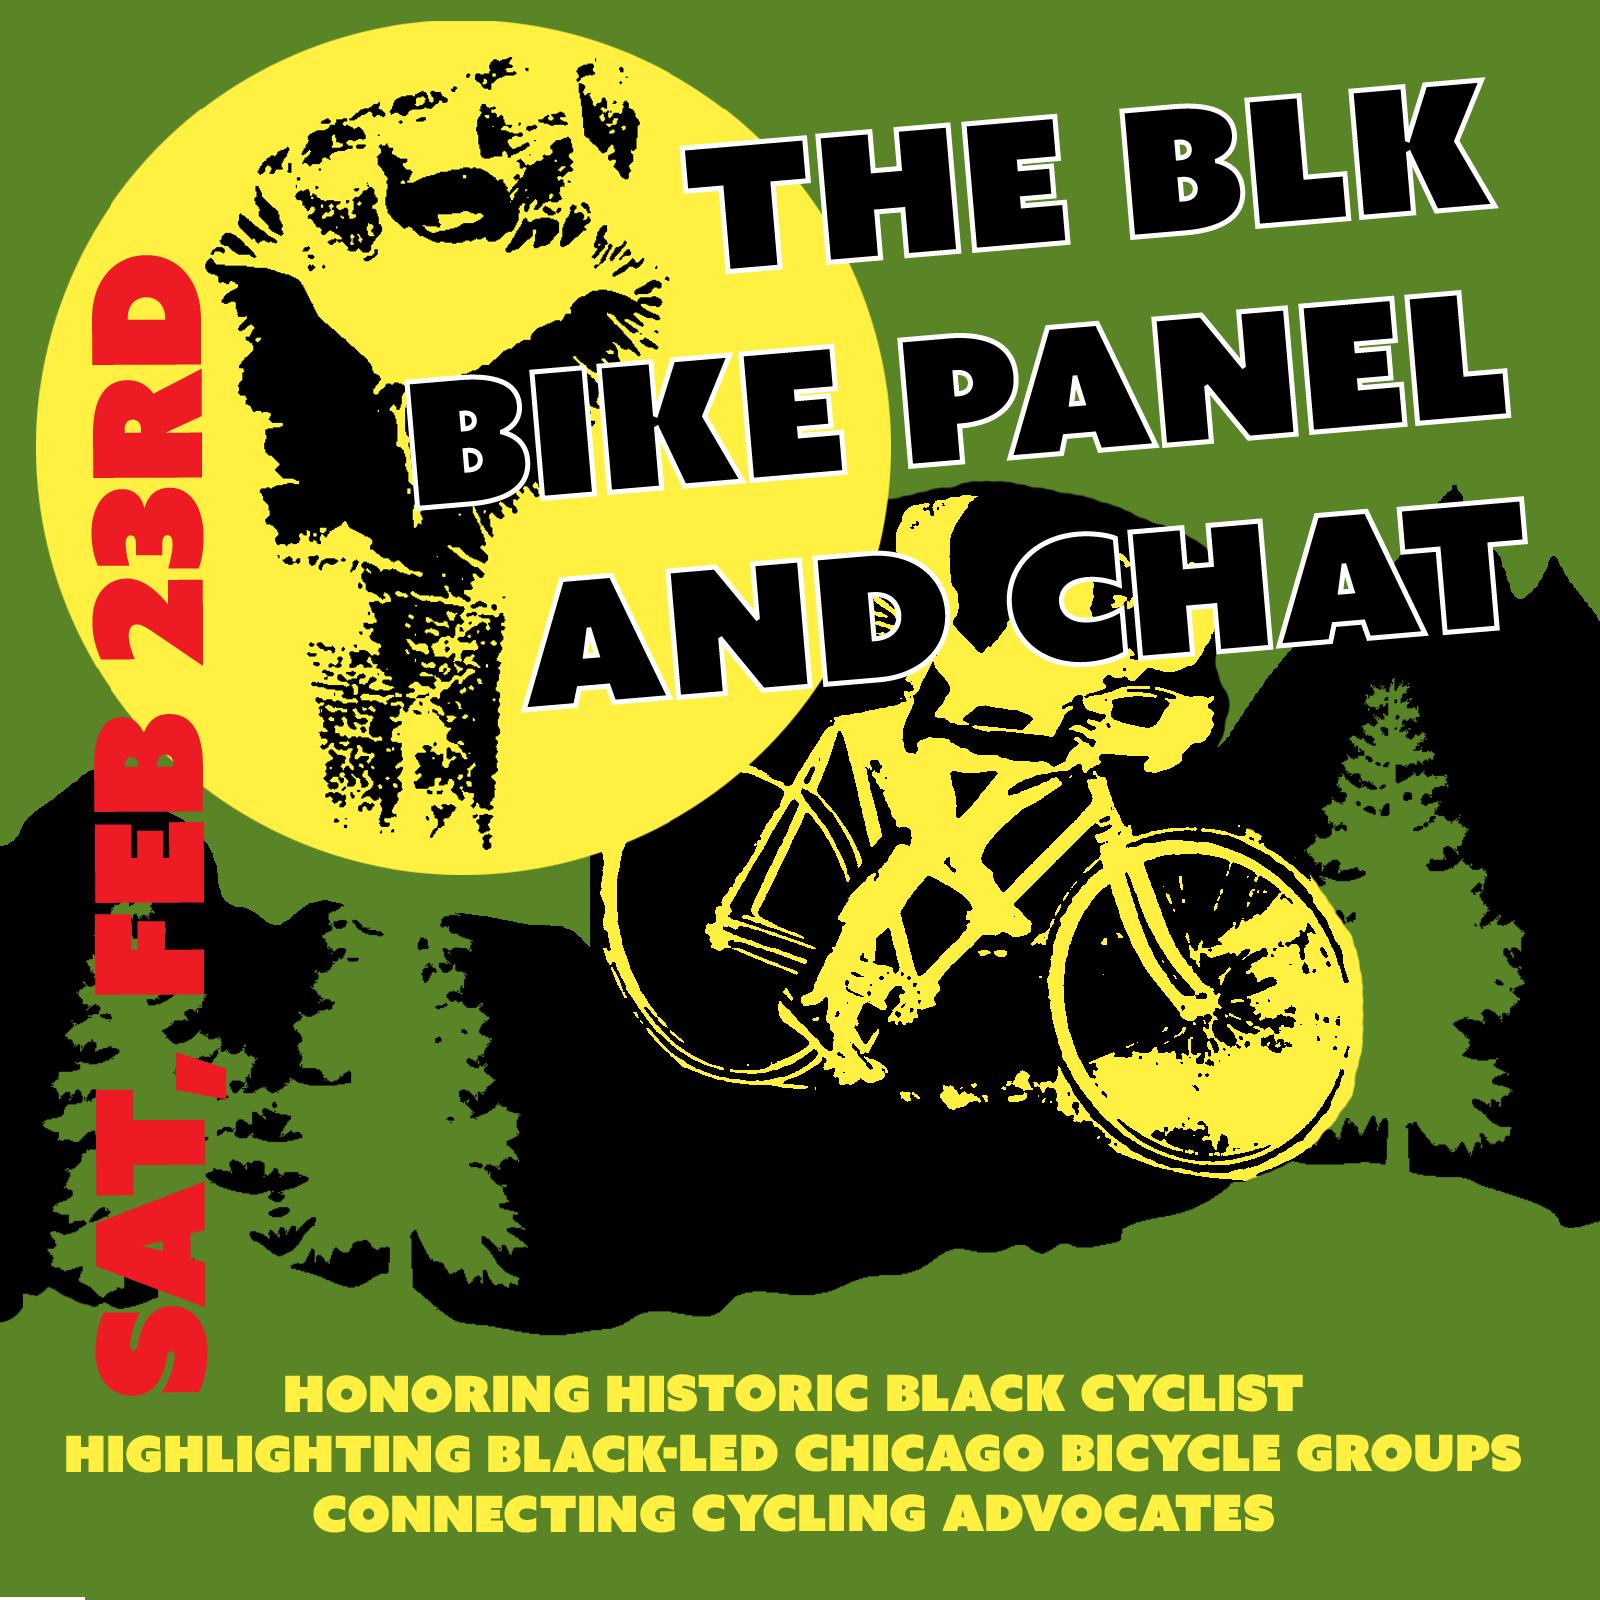 2018-02-04_BLK Bike Panel-01.png